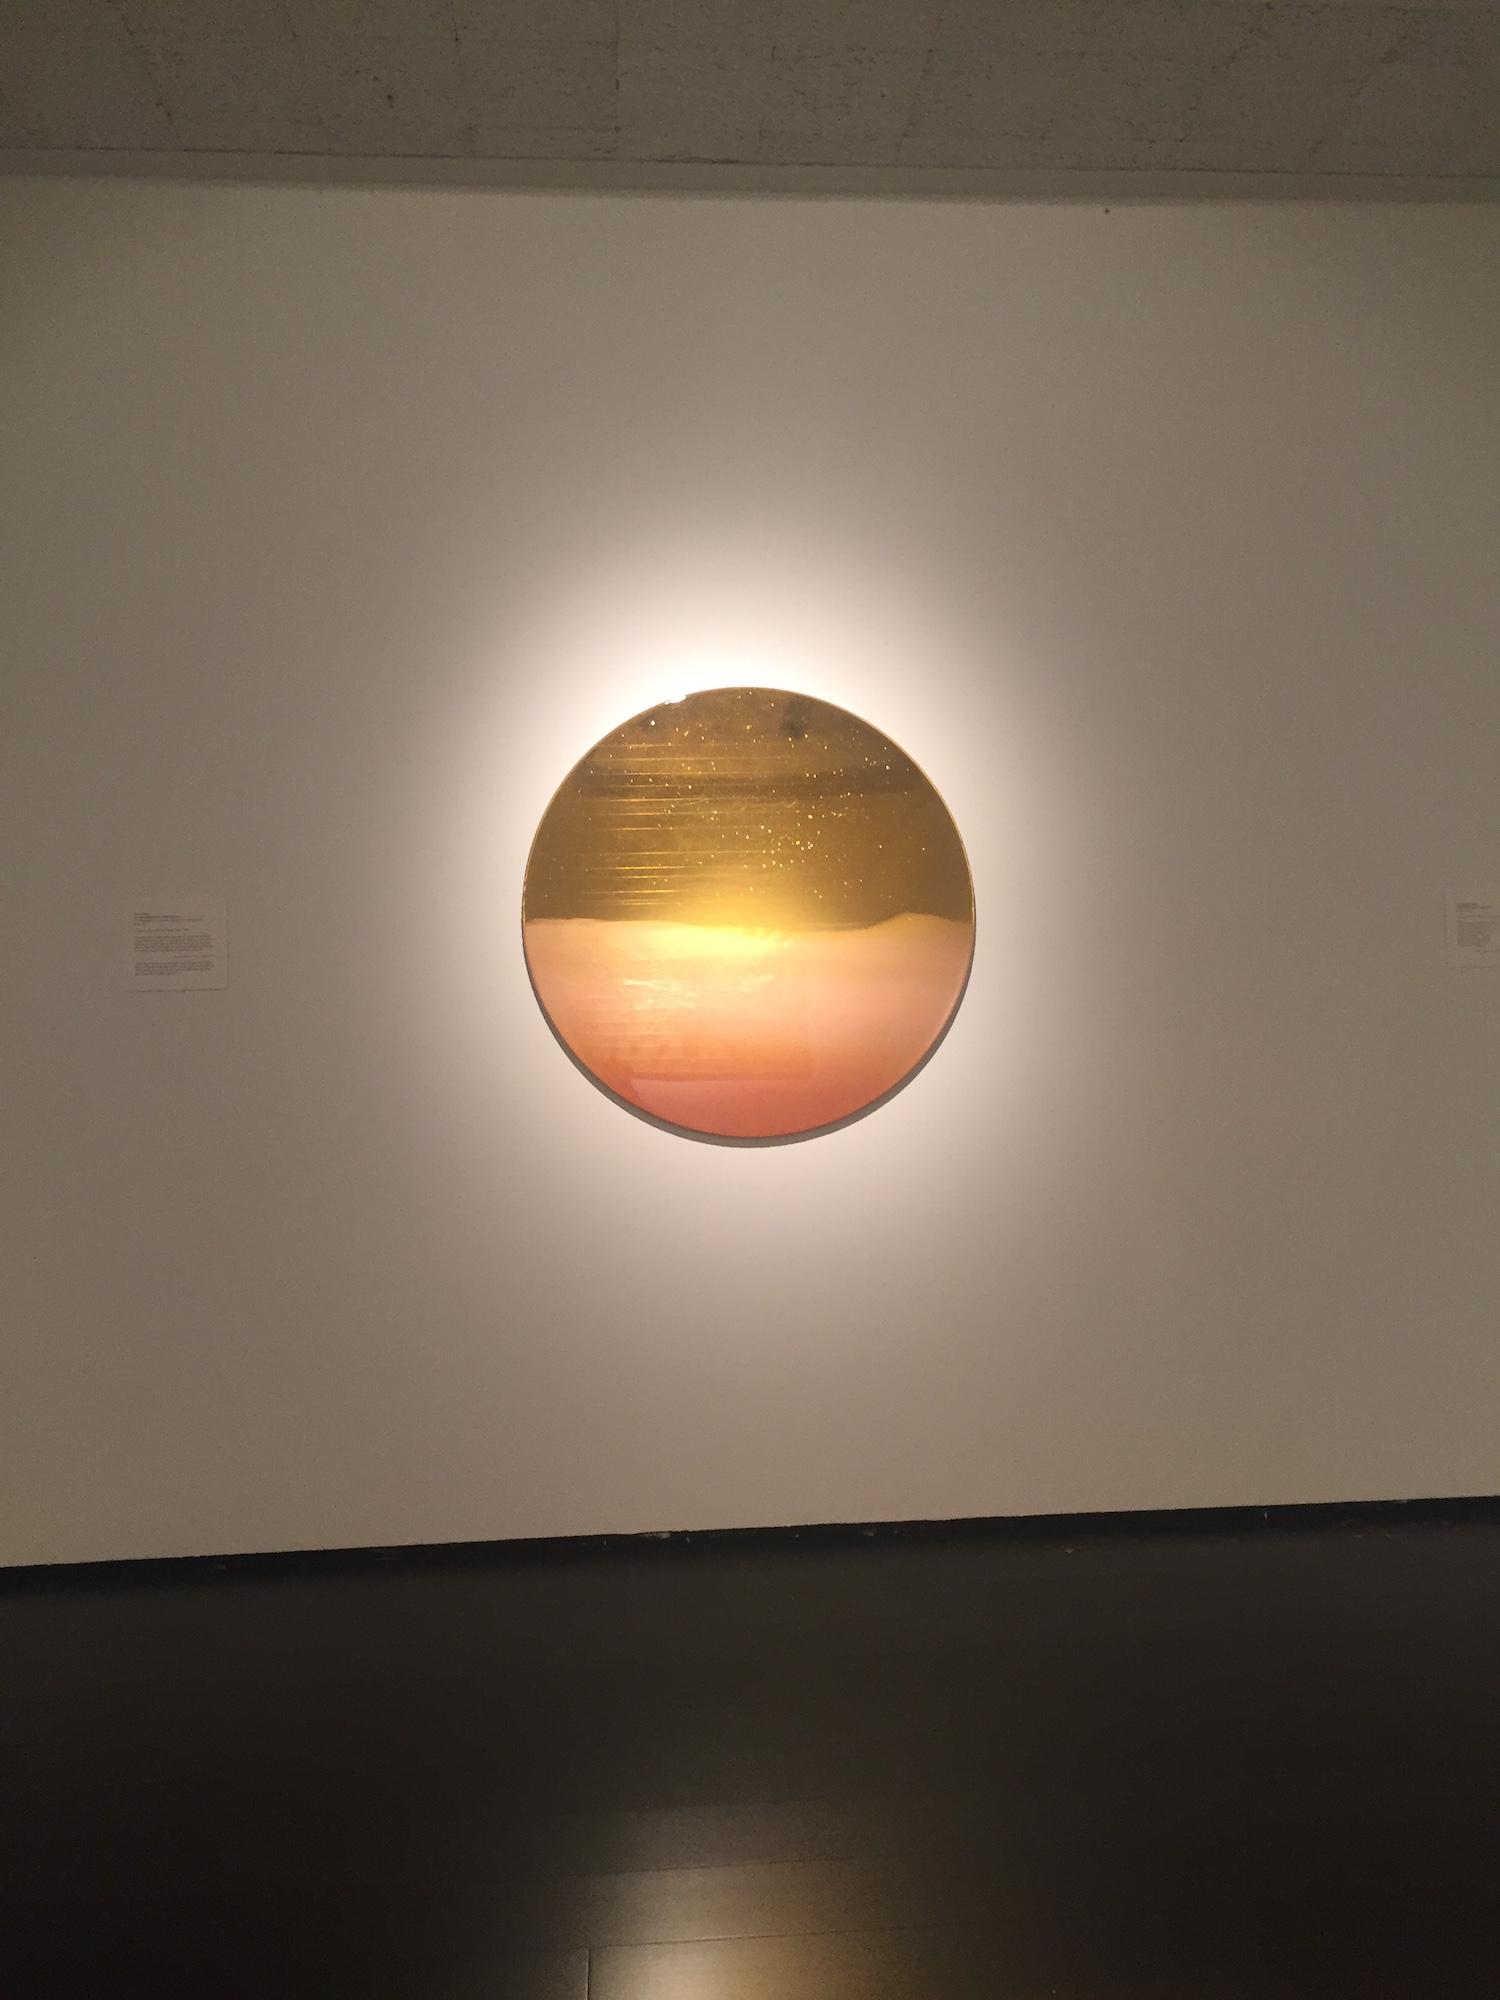 DE SAISSET MUSEUM, SANTA CLARA UNIVERSITY, SANTA CLARA, CA  GOLD RUSH 2016  EXHIBITION INFO